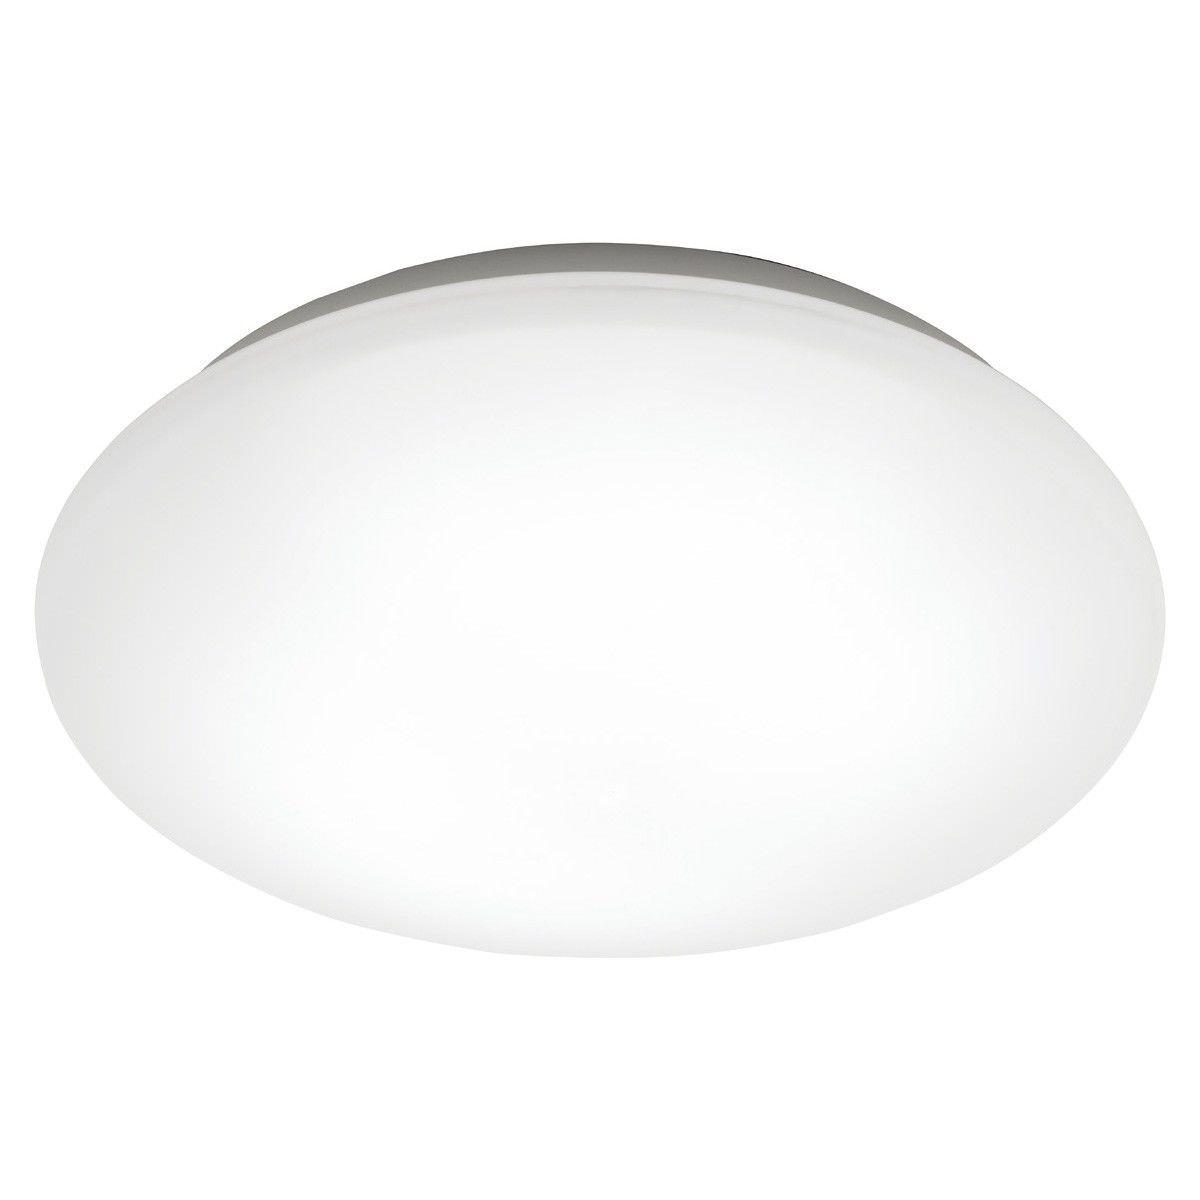 Kobe LED Oyster Light, 27W, 5000K